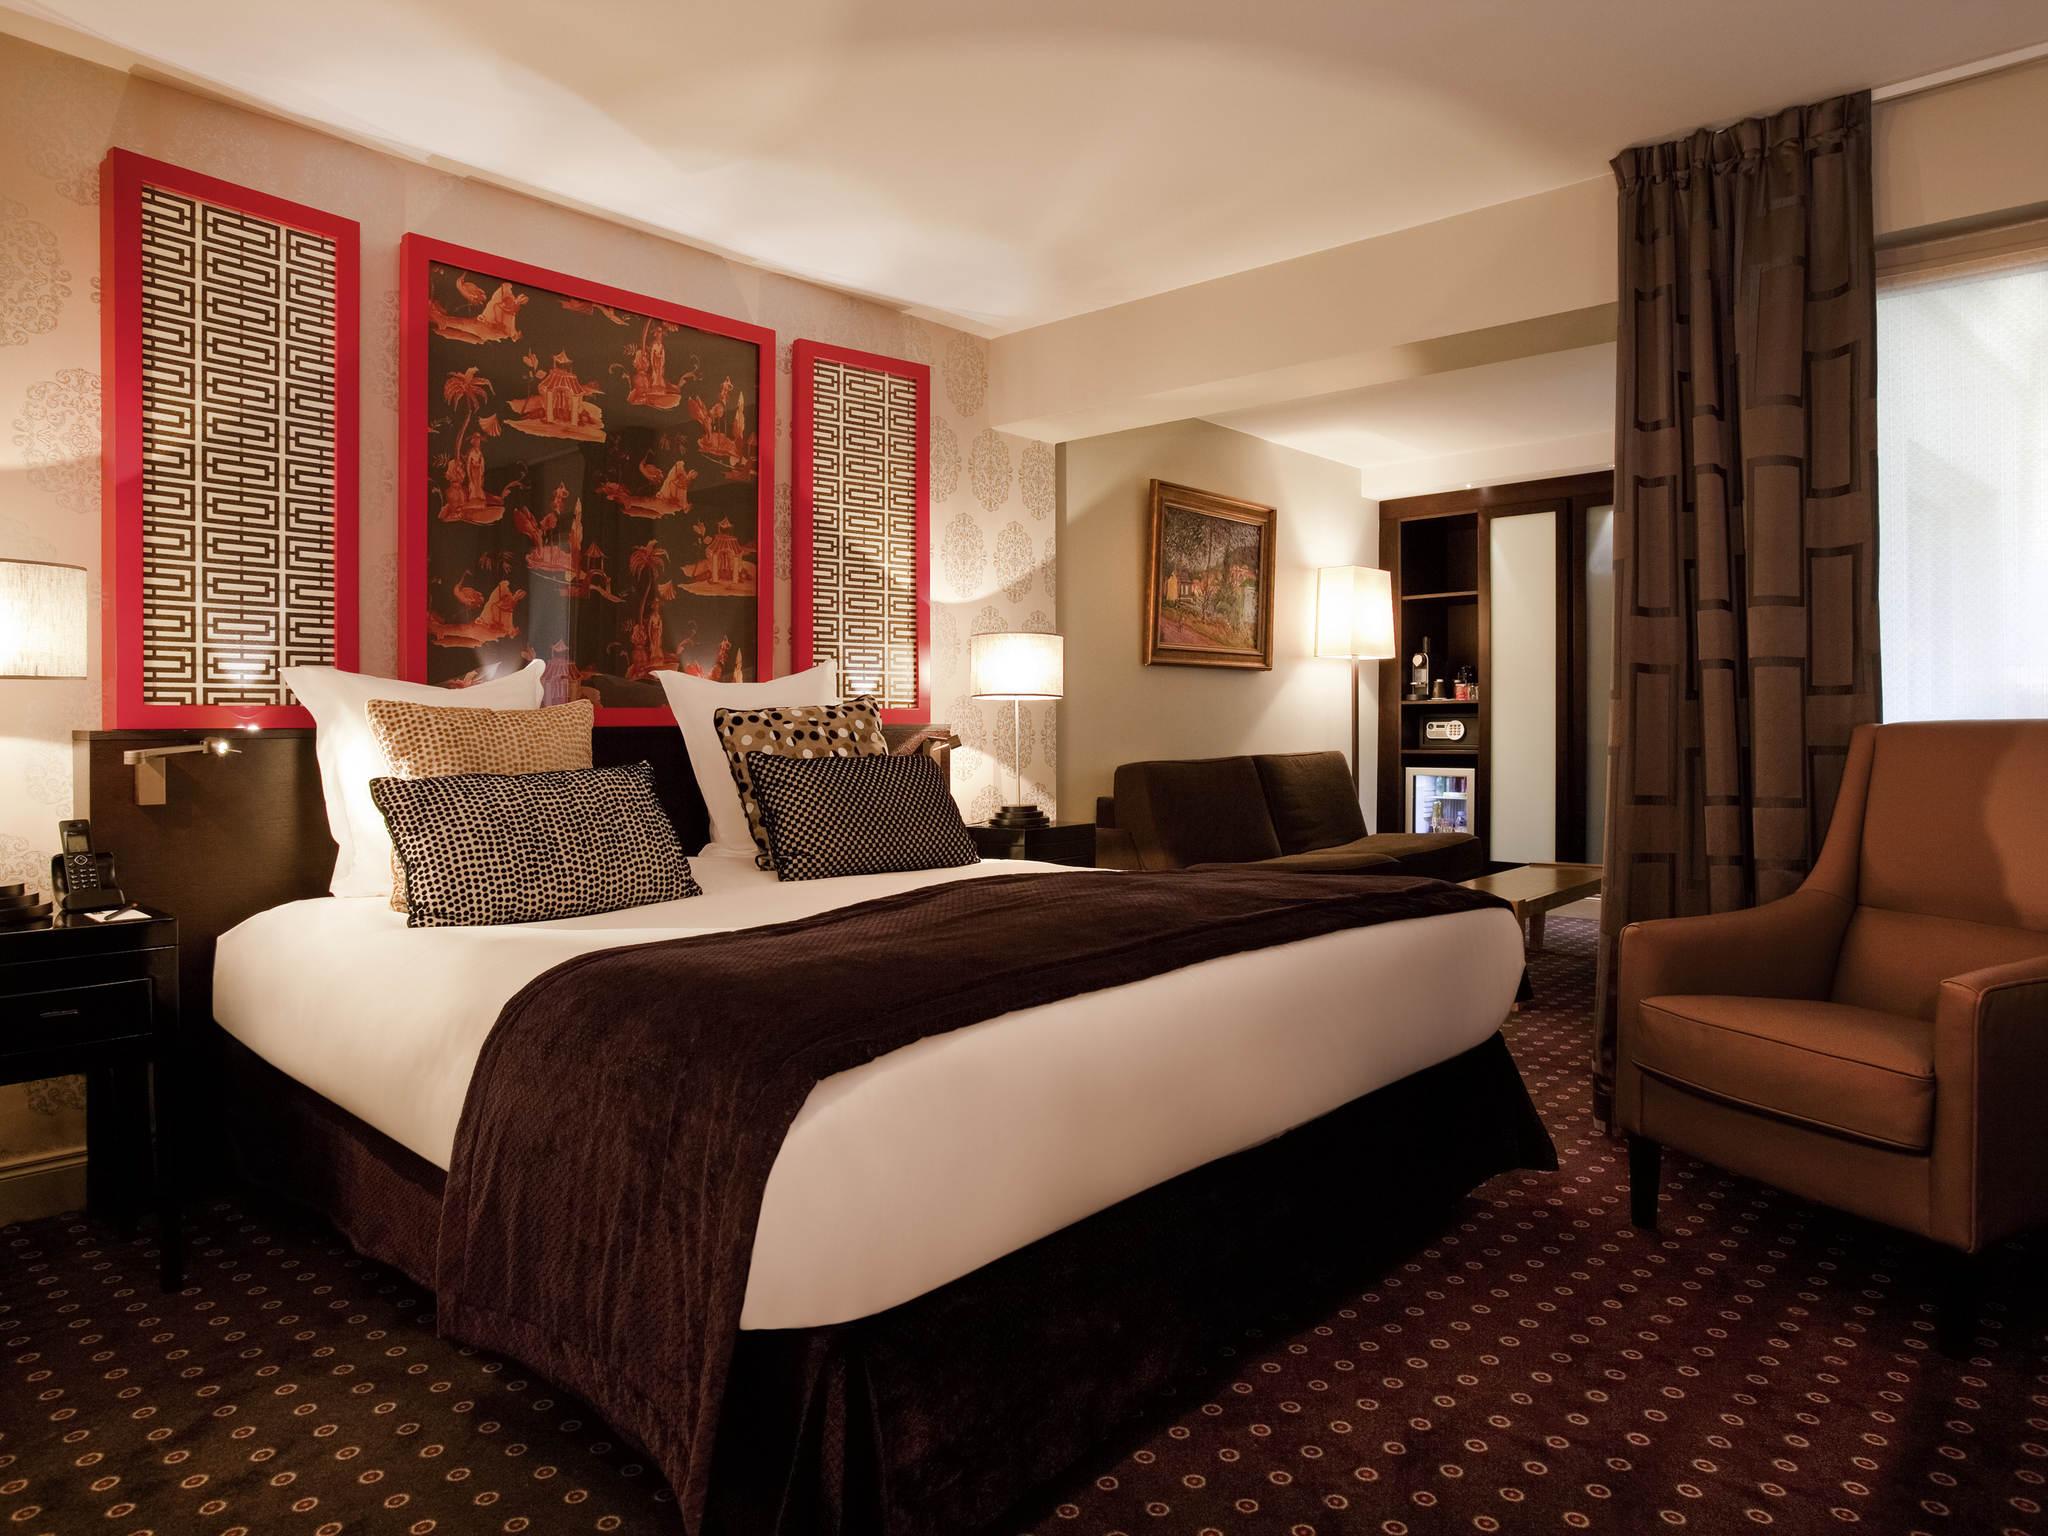 Hotel - Hotel Stendhal Place Vendome Paris - MGallery by Sofitel